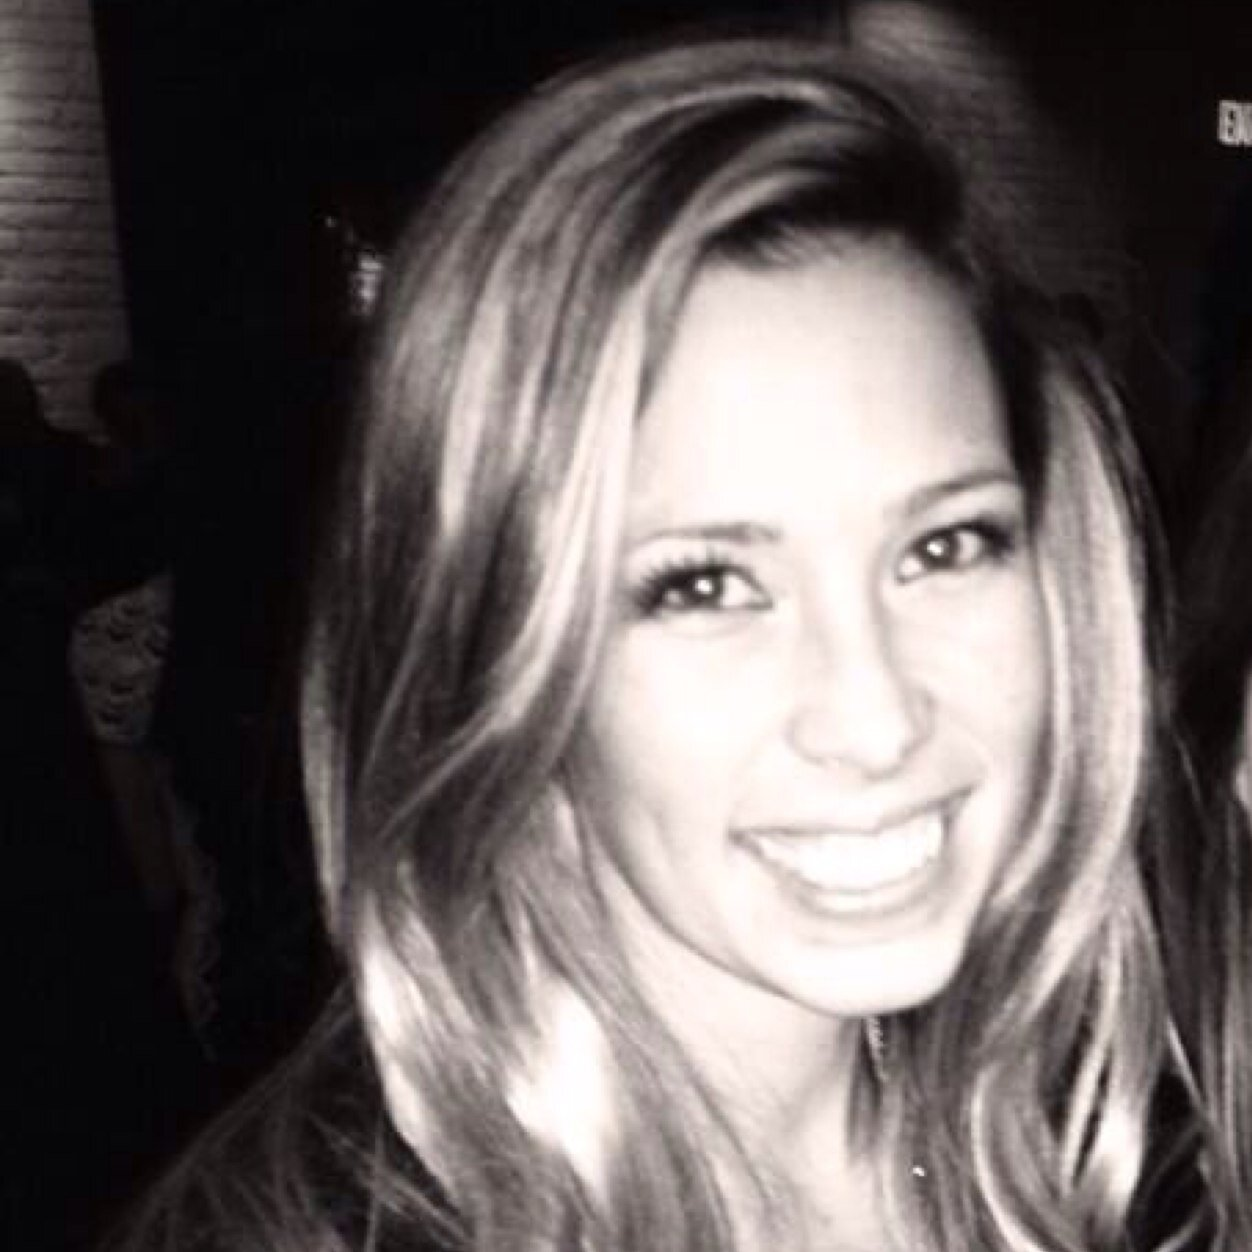 Bryan Bickell's wife Amanda Bickell